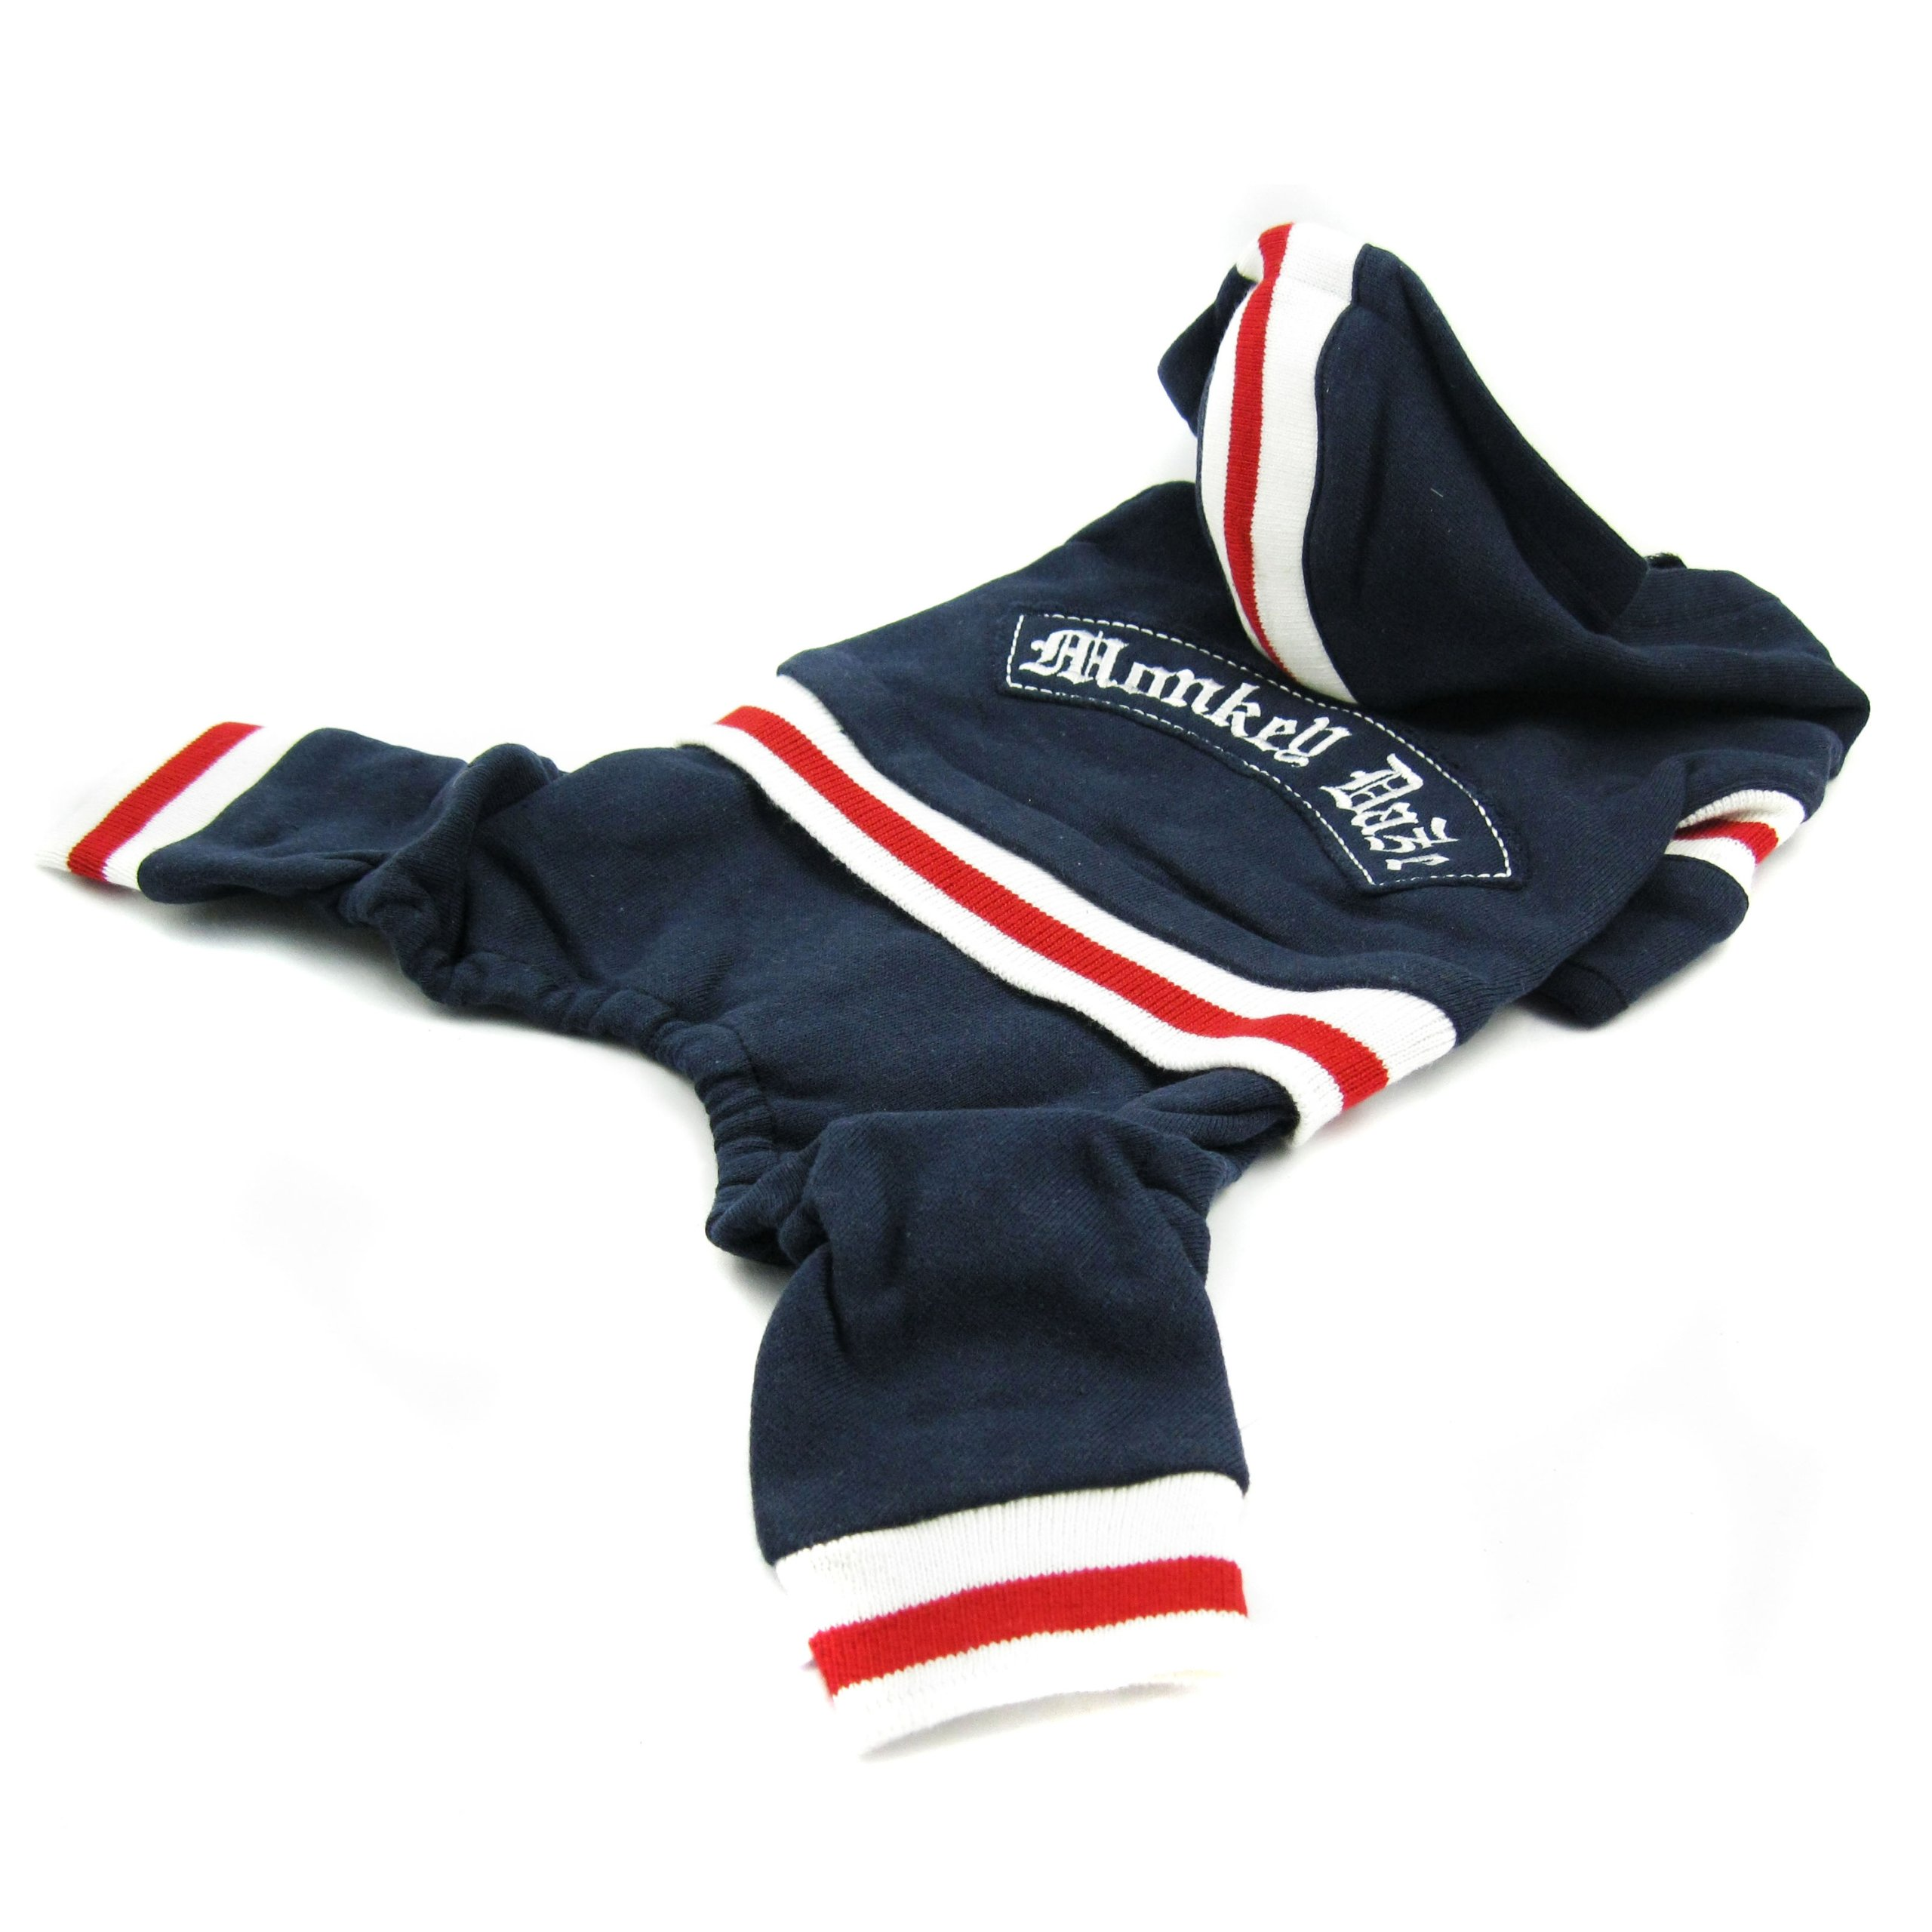 Monkey Daze Designer Dog Apparel - Navy Fleece Monkey Jumper Pant - Color: Navy, Size: S